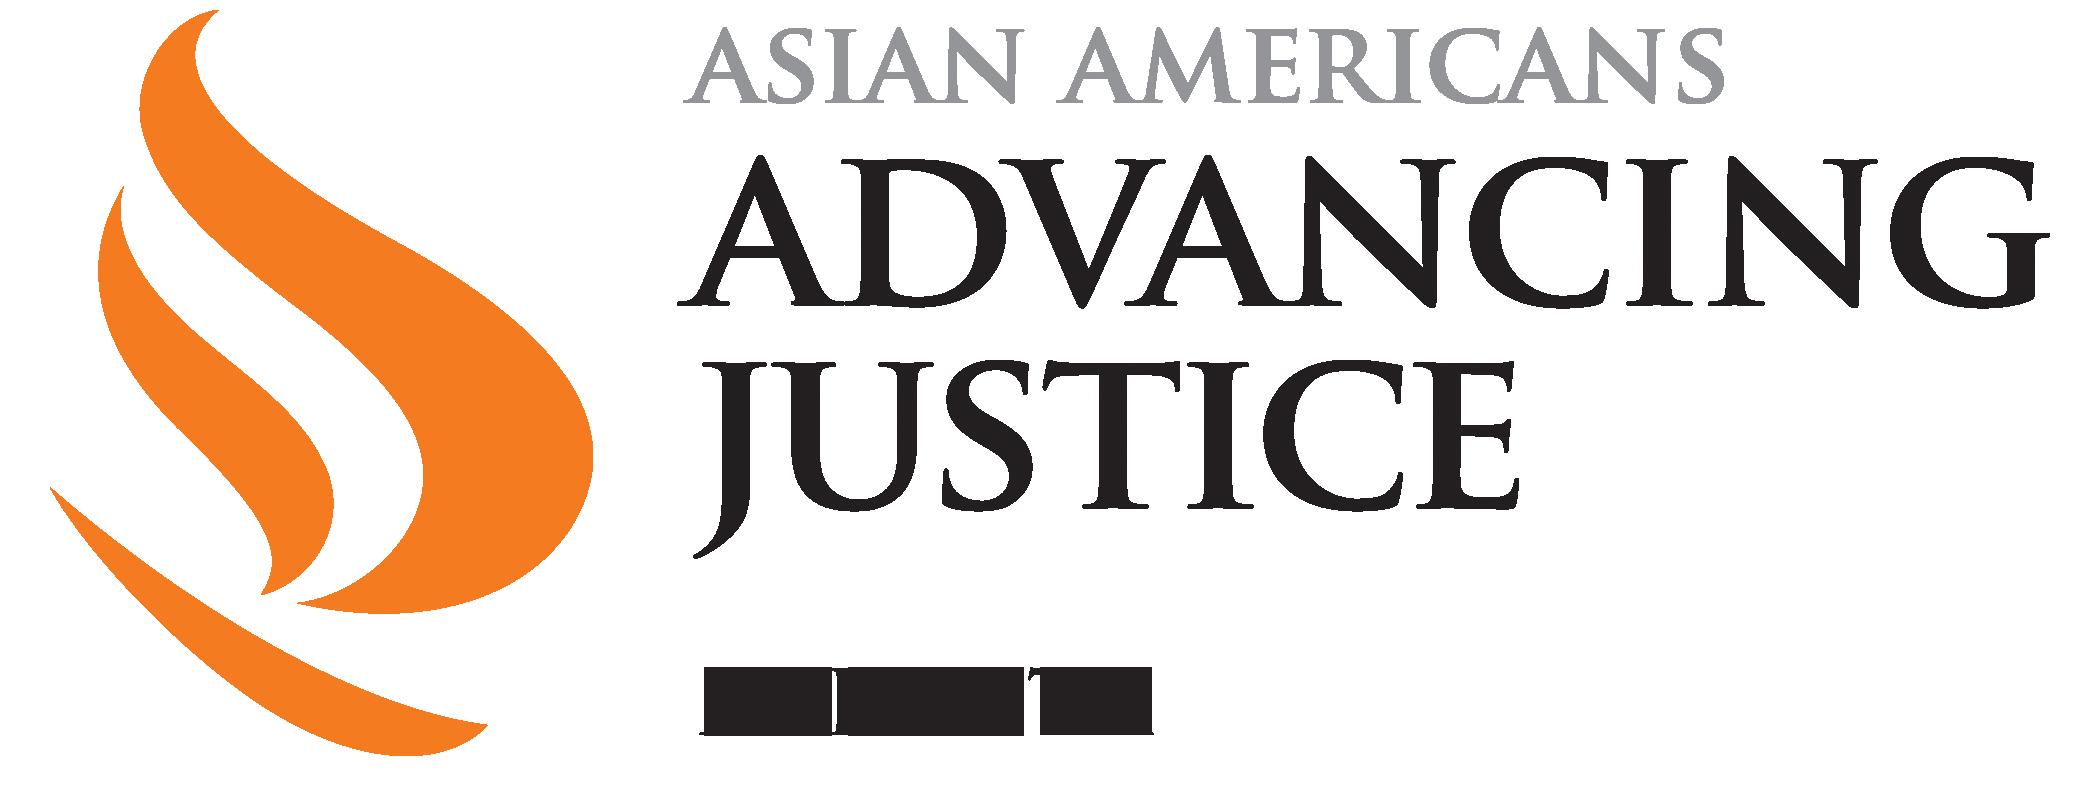 Aaaj-atl_logo_main